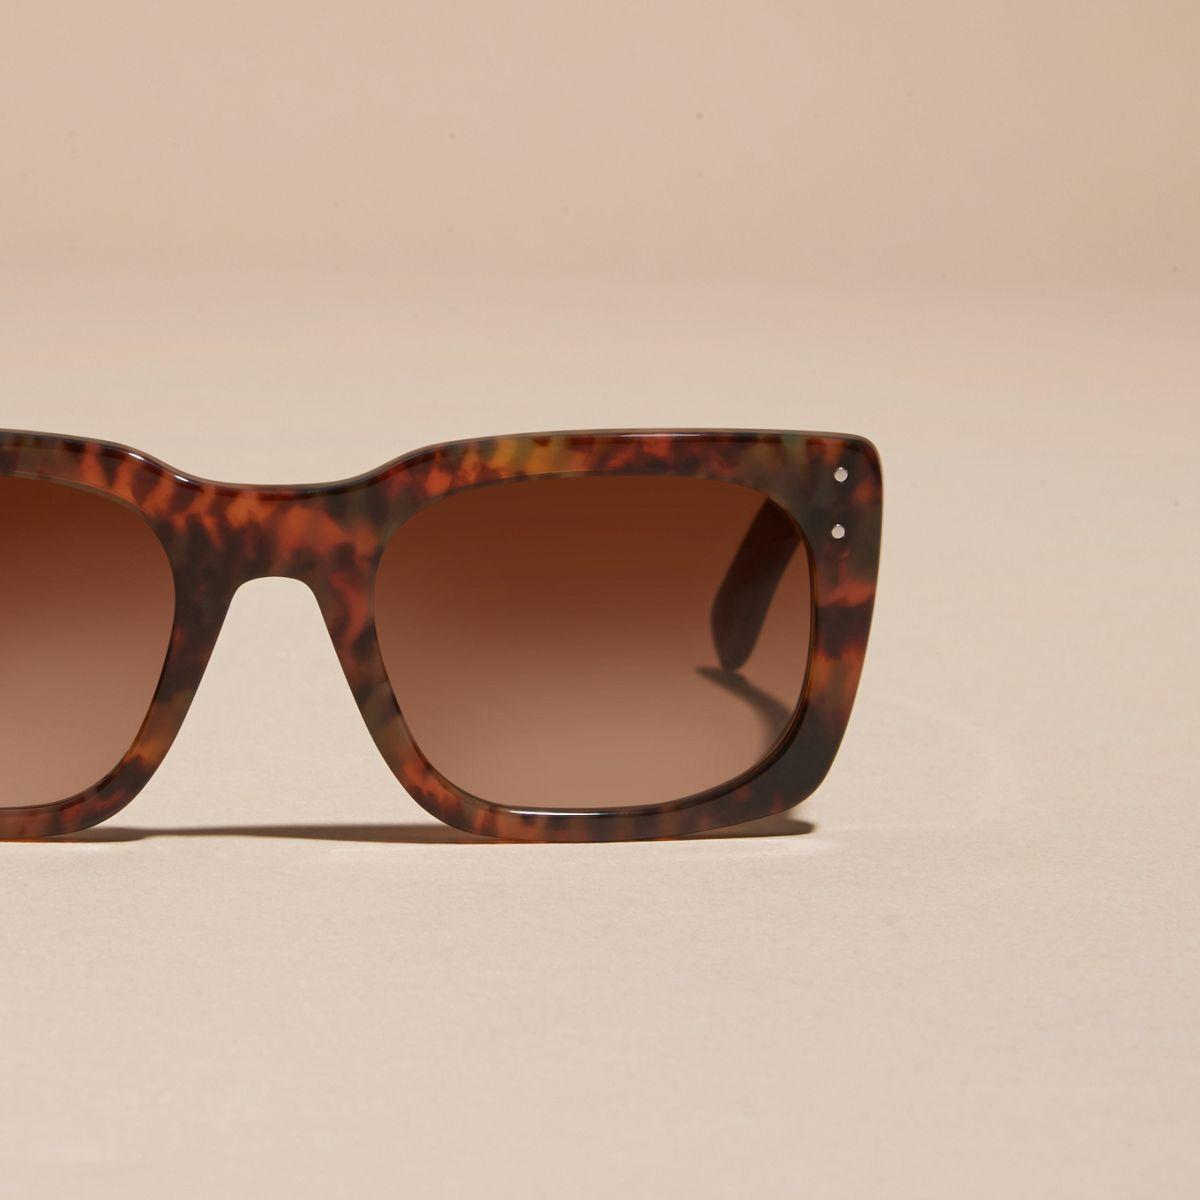 Burberry Square Frame Sunglasses in Tortoise Shell (Yellow) for Men